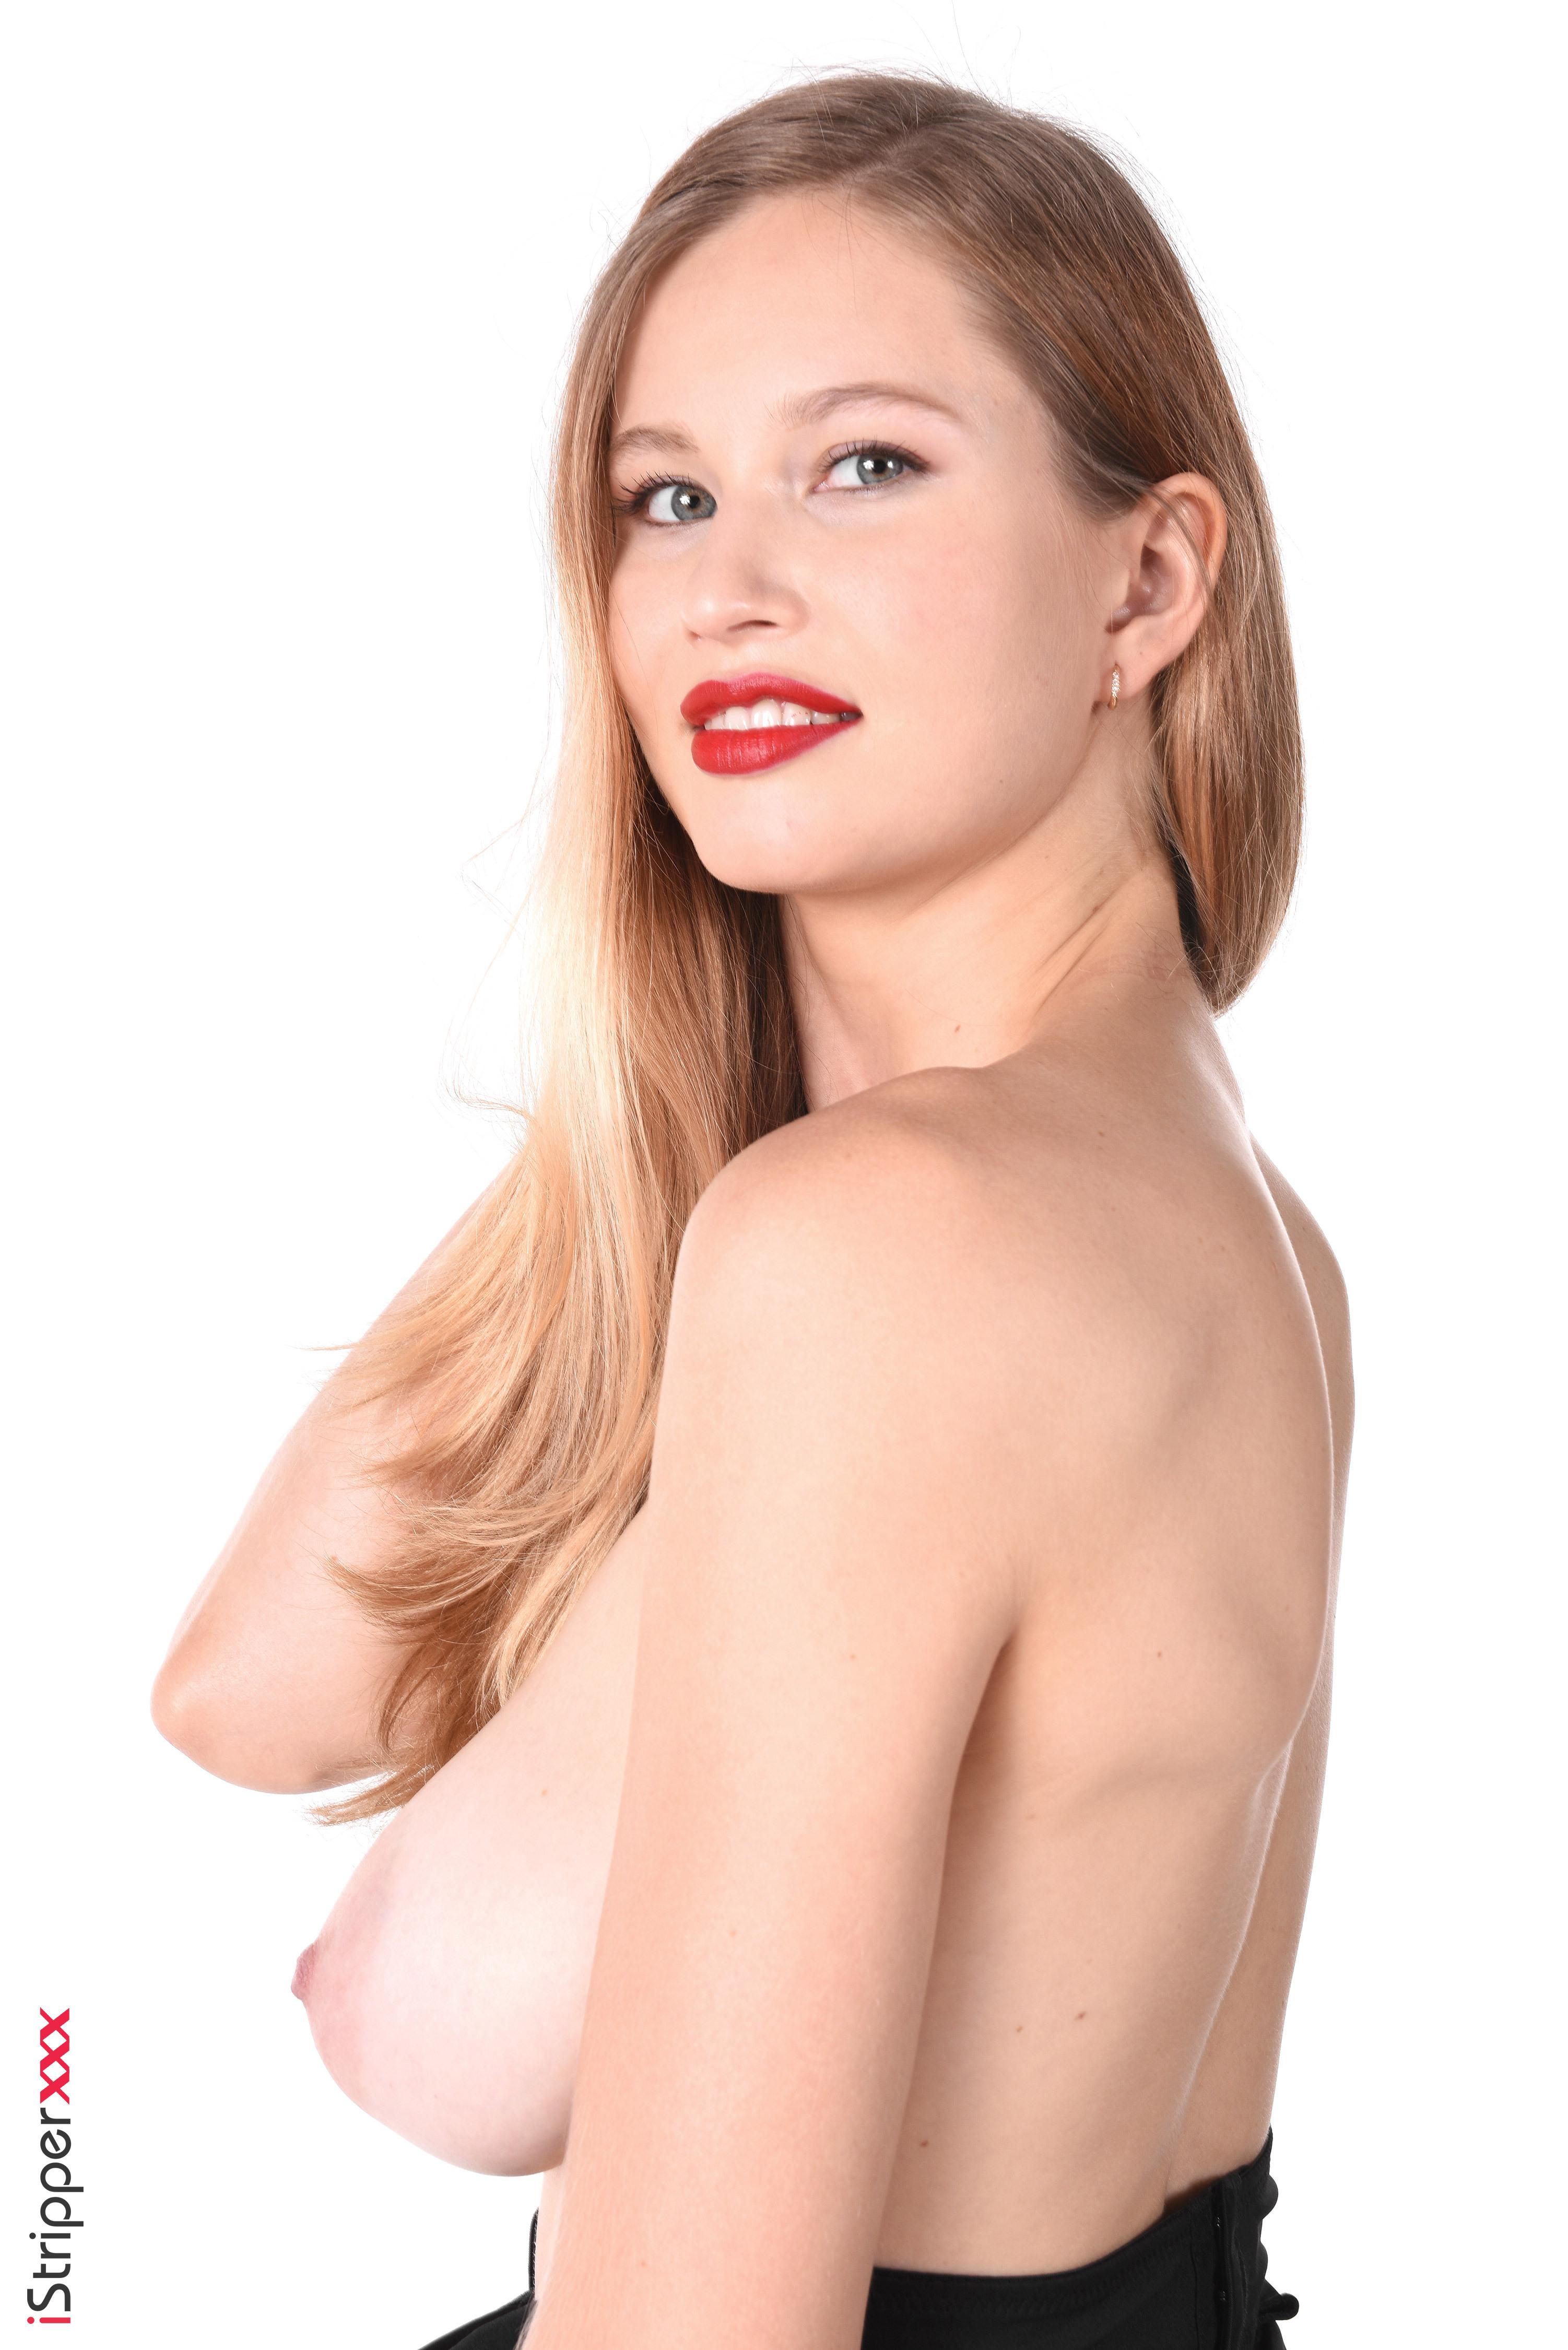 nude Girlies full hd wallpapers